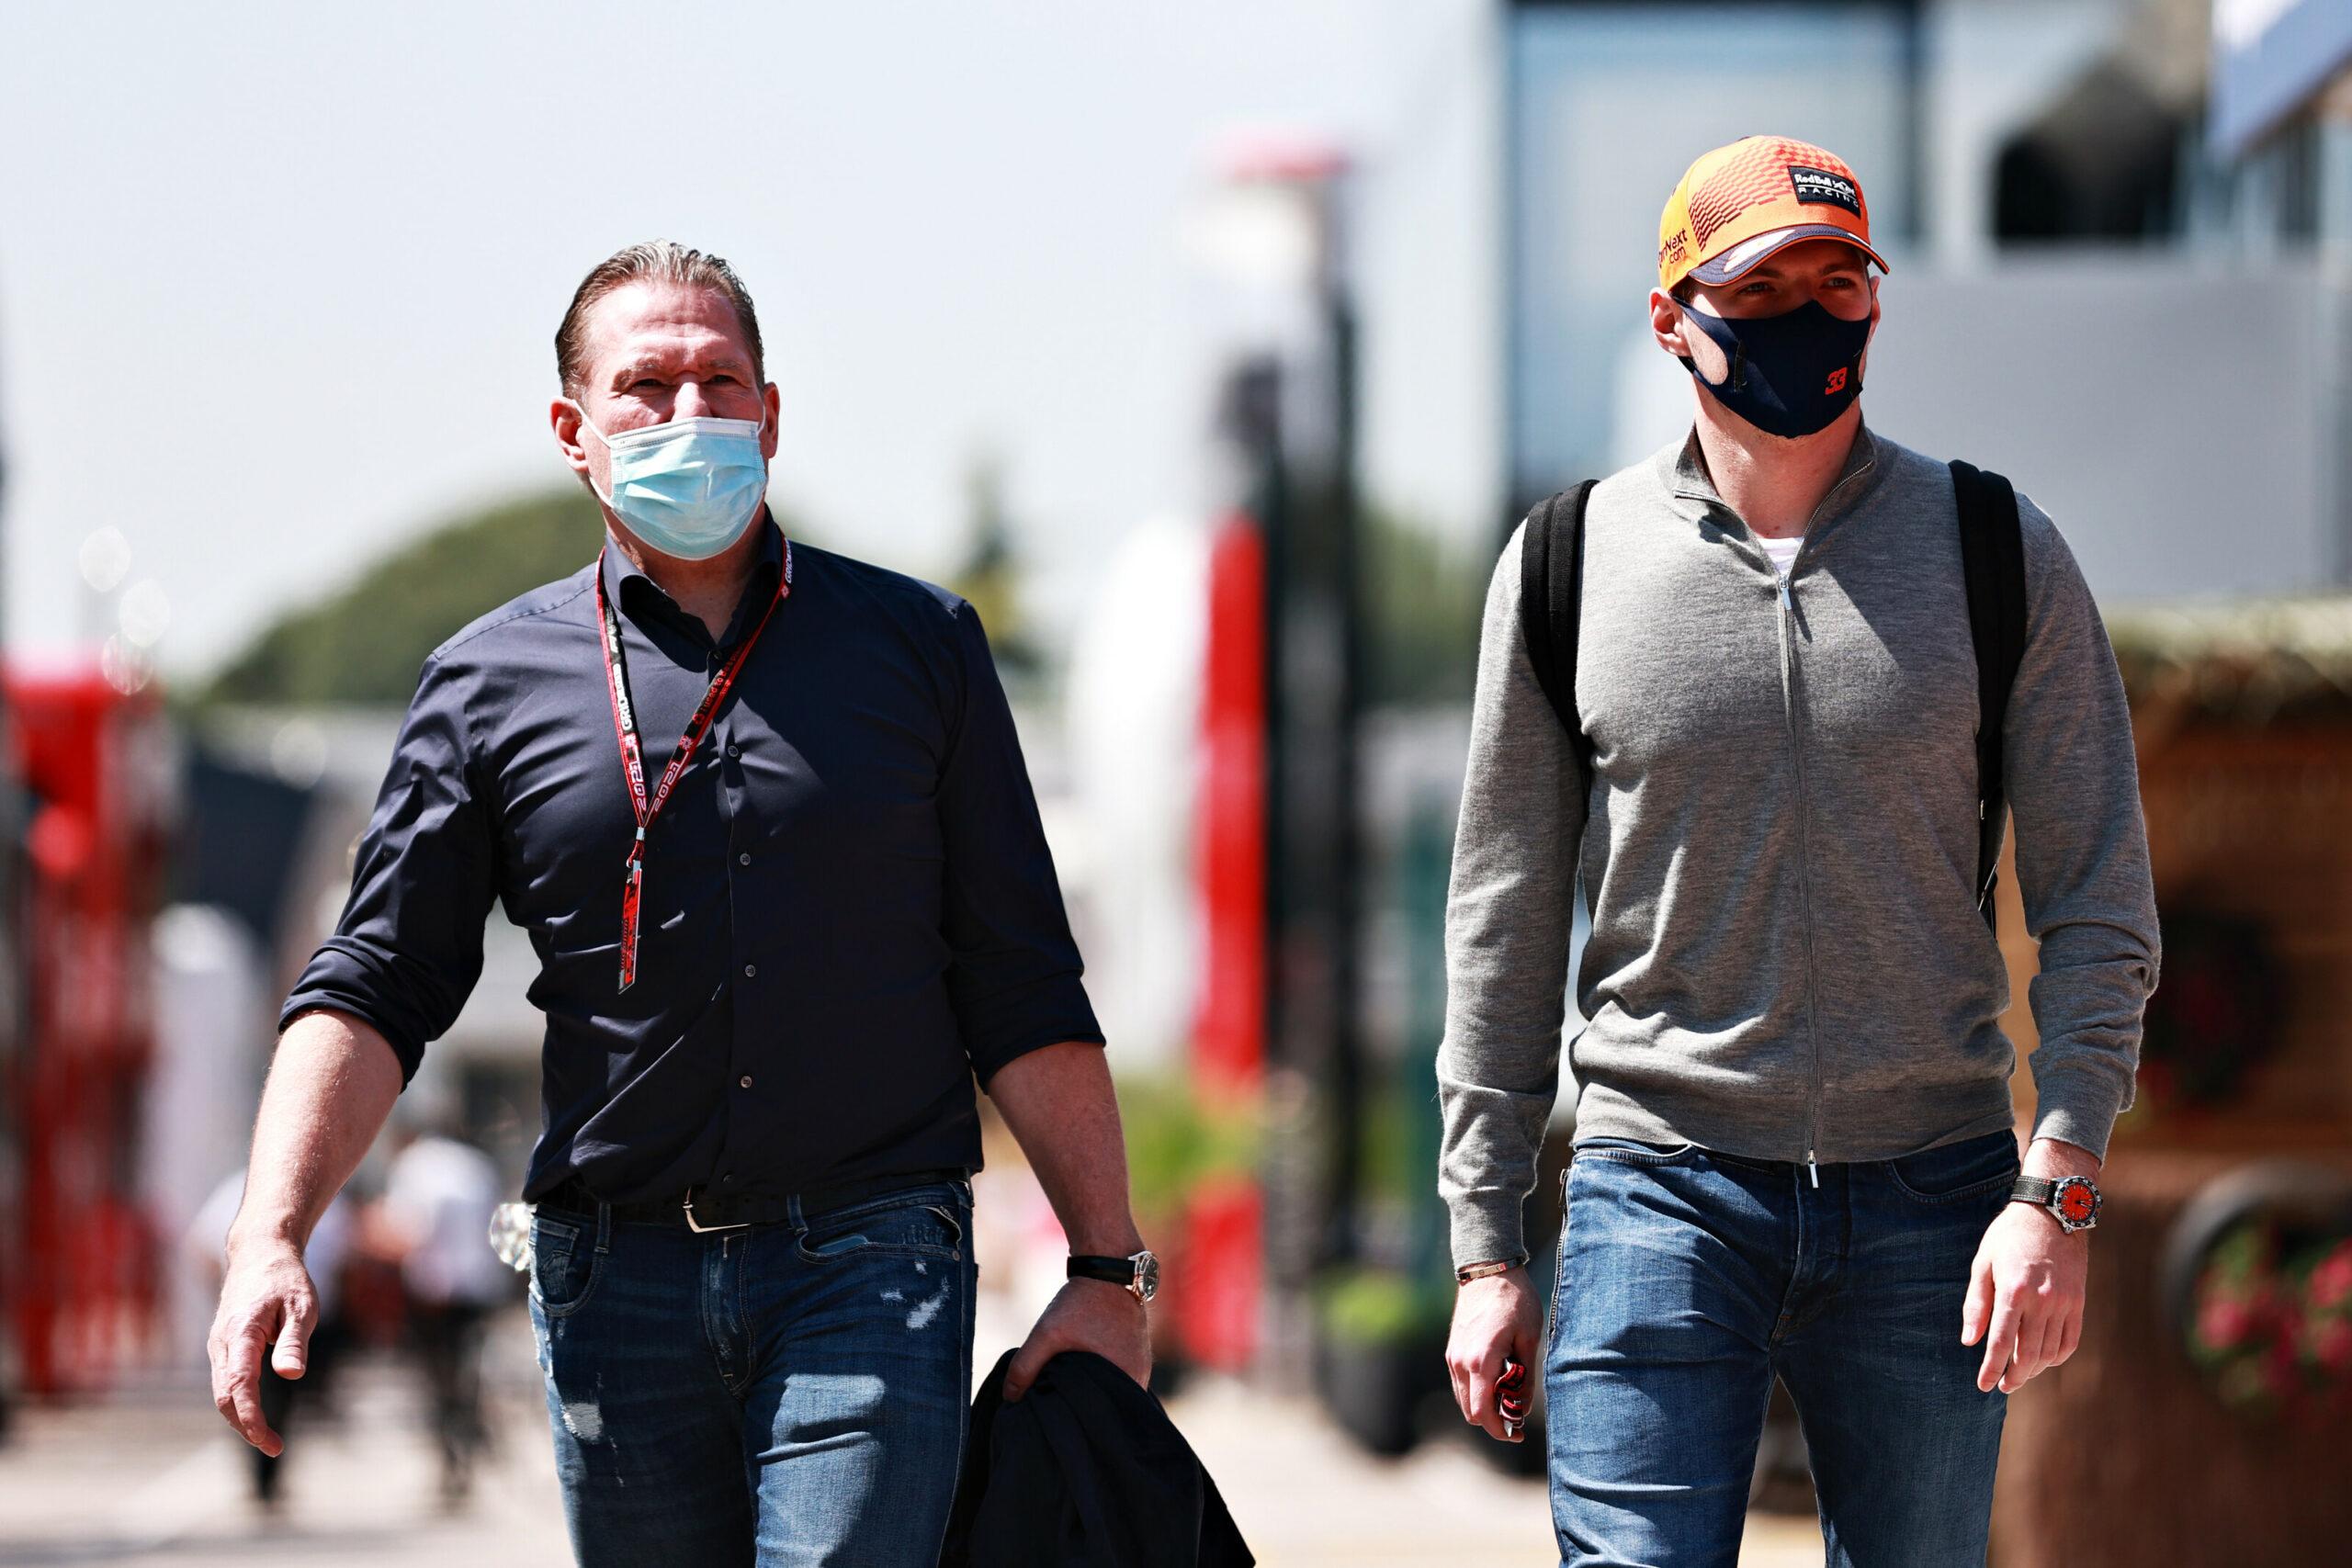 F1 - La F1 confirme un cas positif Covid-19 au Grand Prix d'Espagne